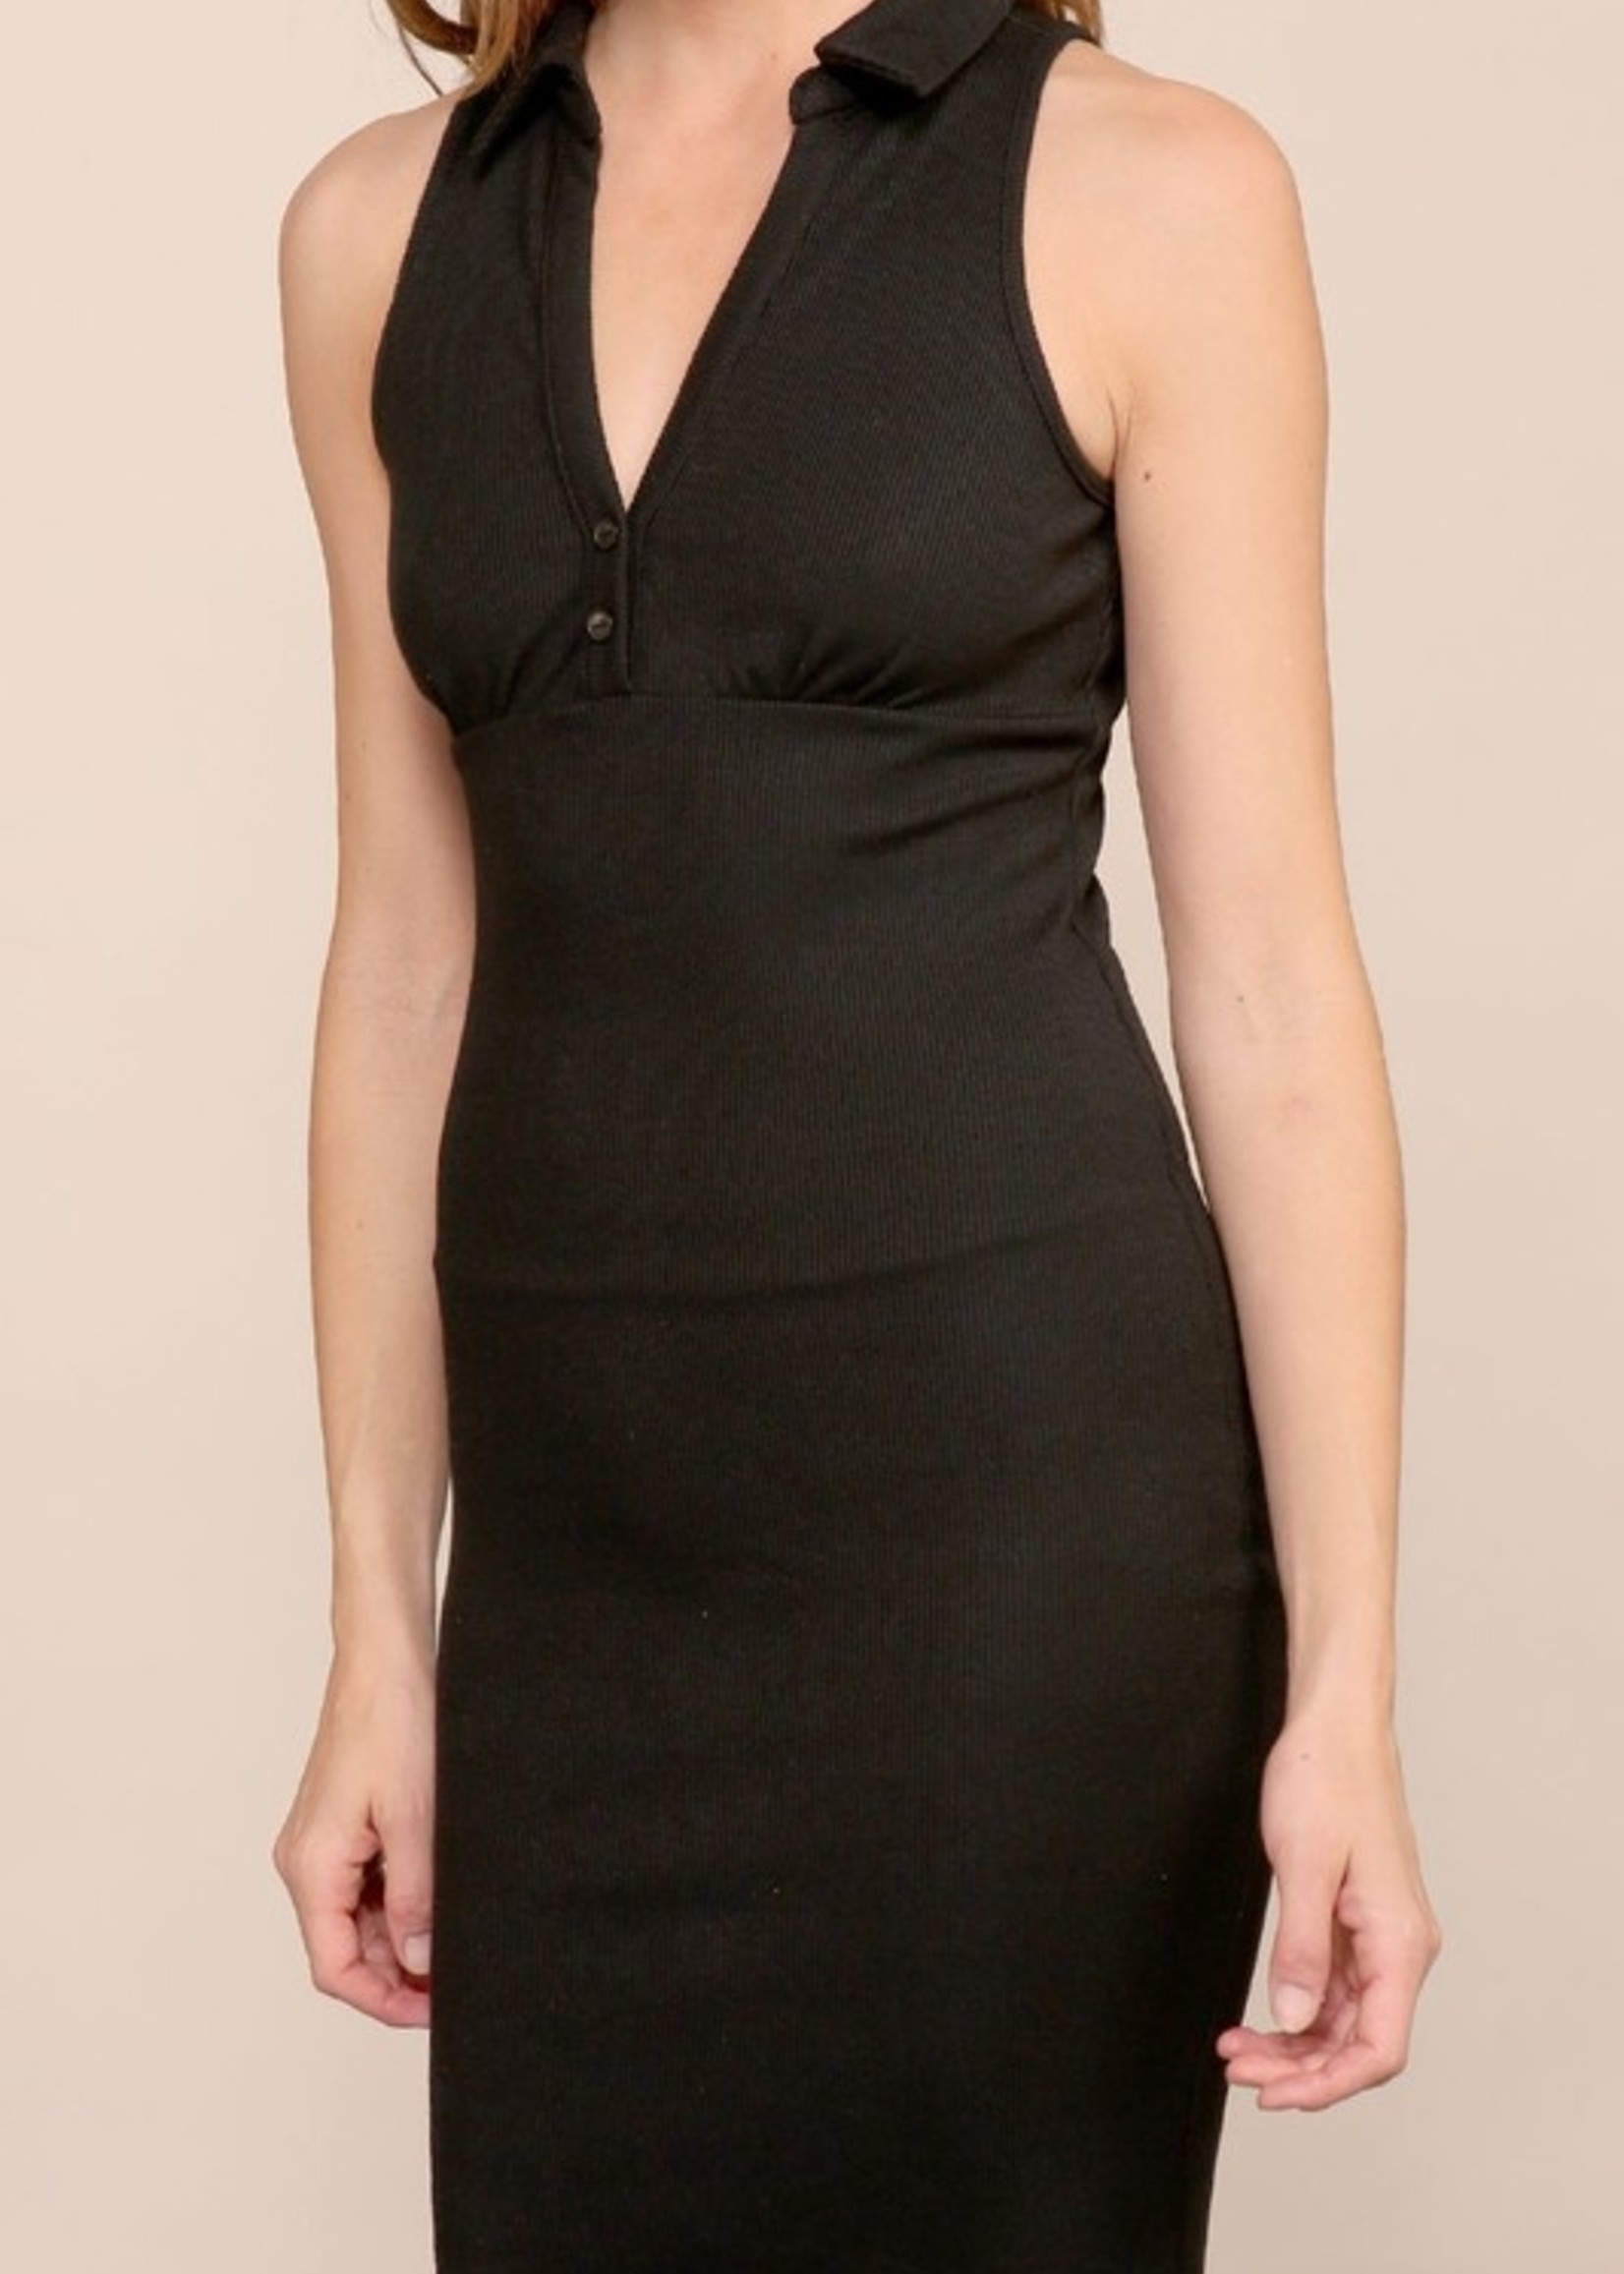 Bodycon dress with collar